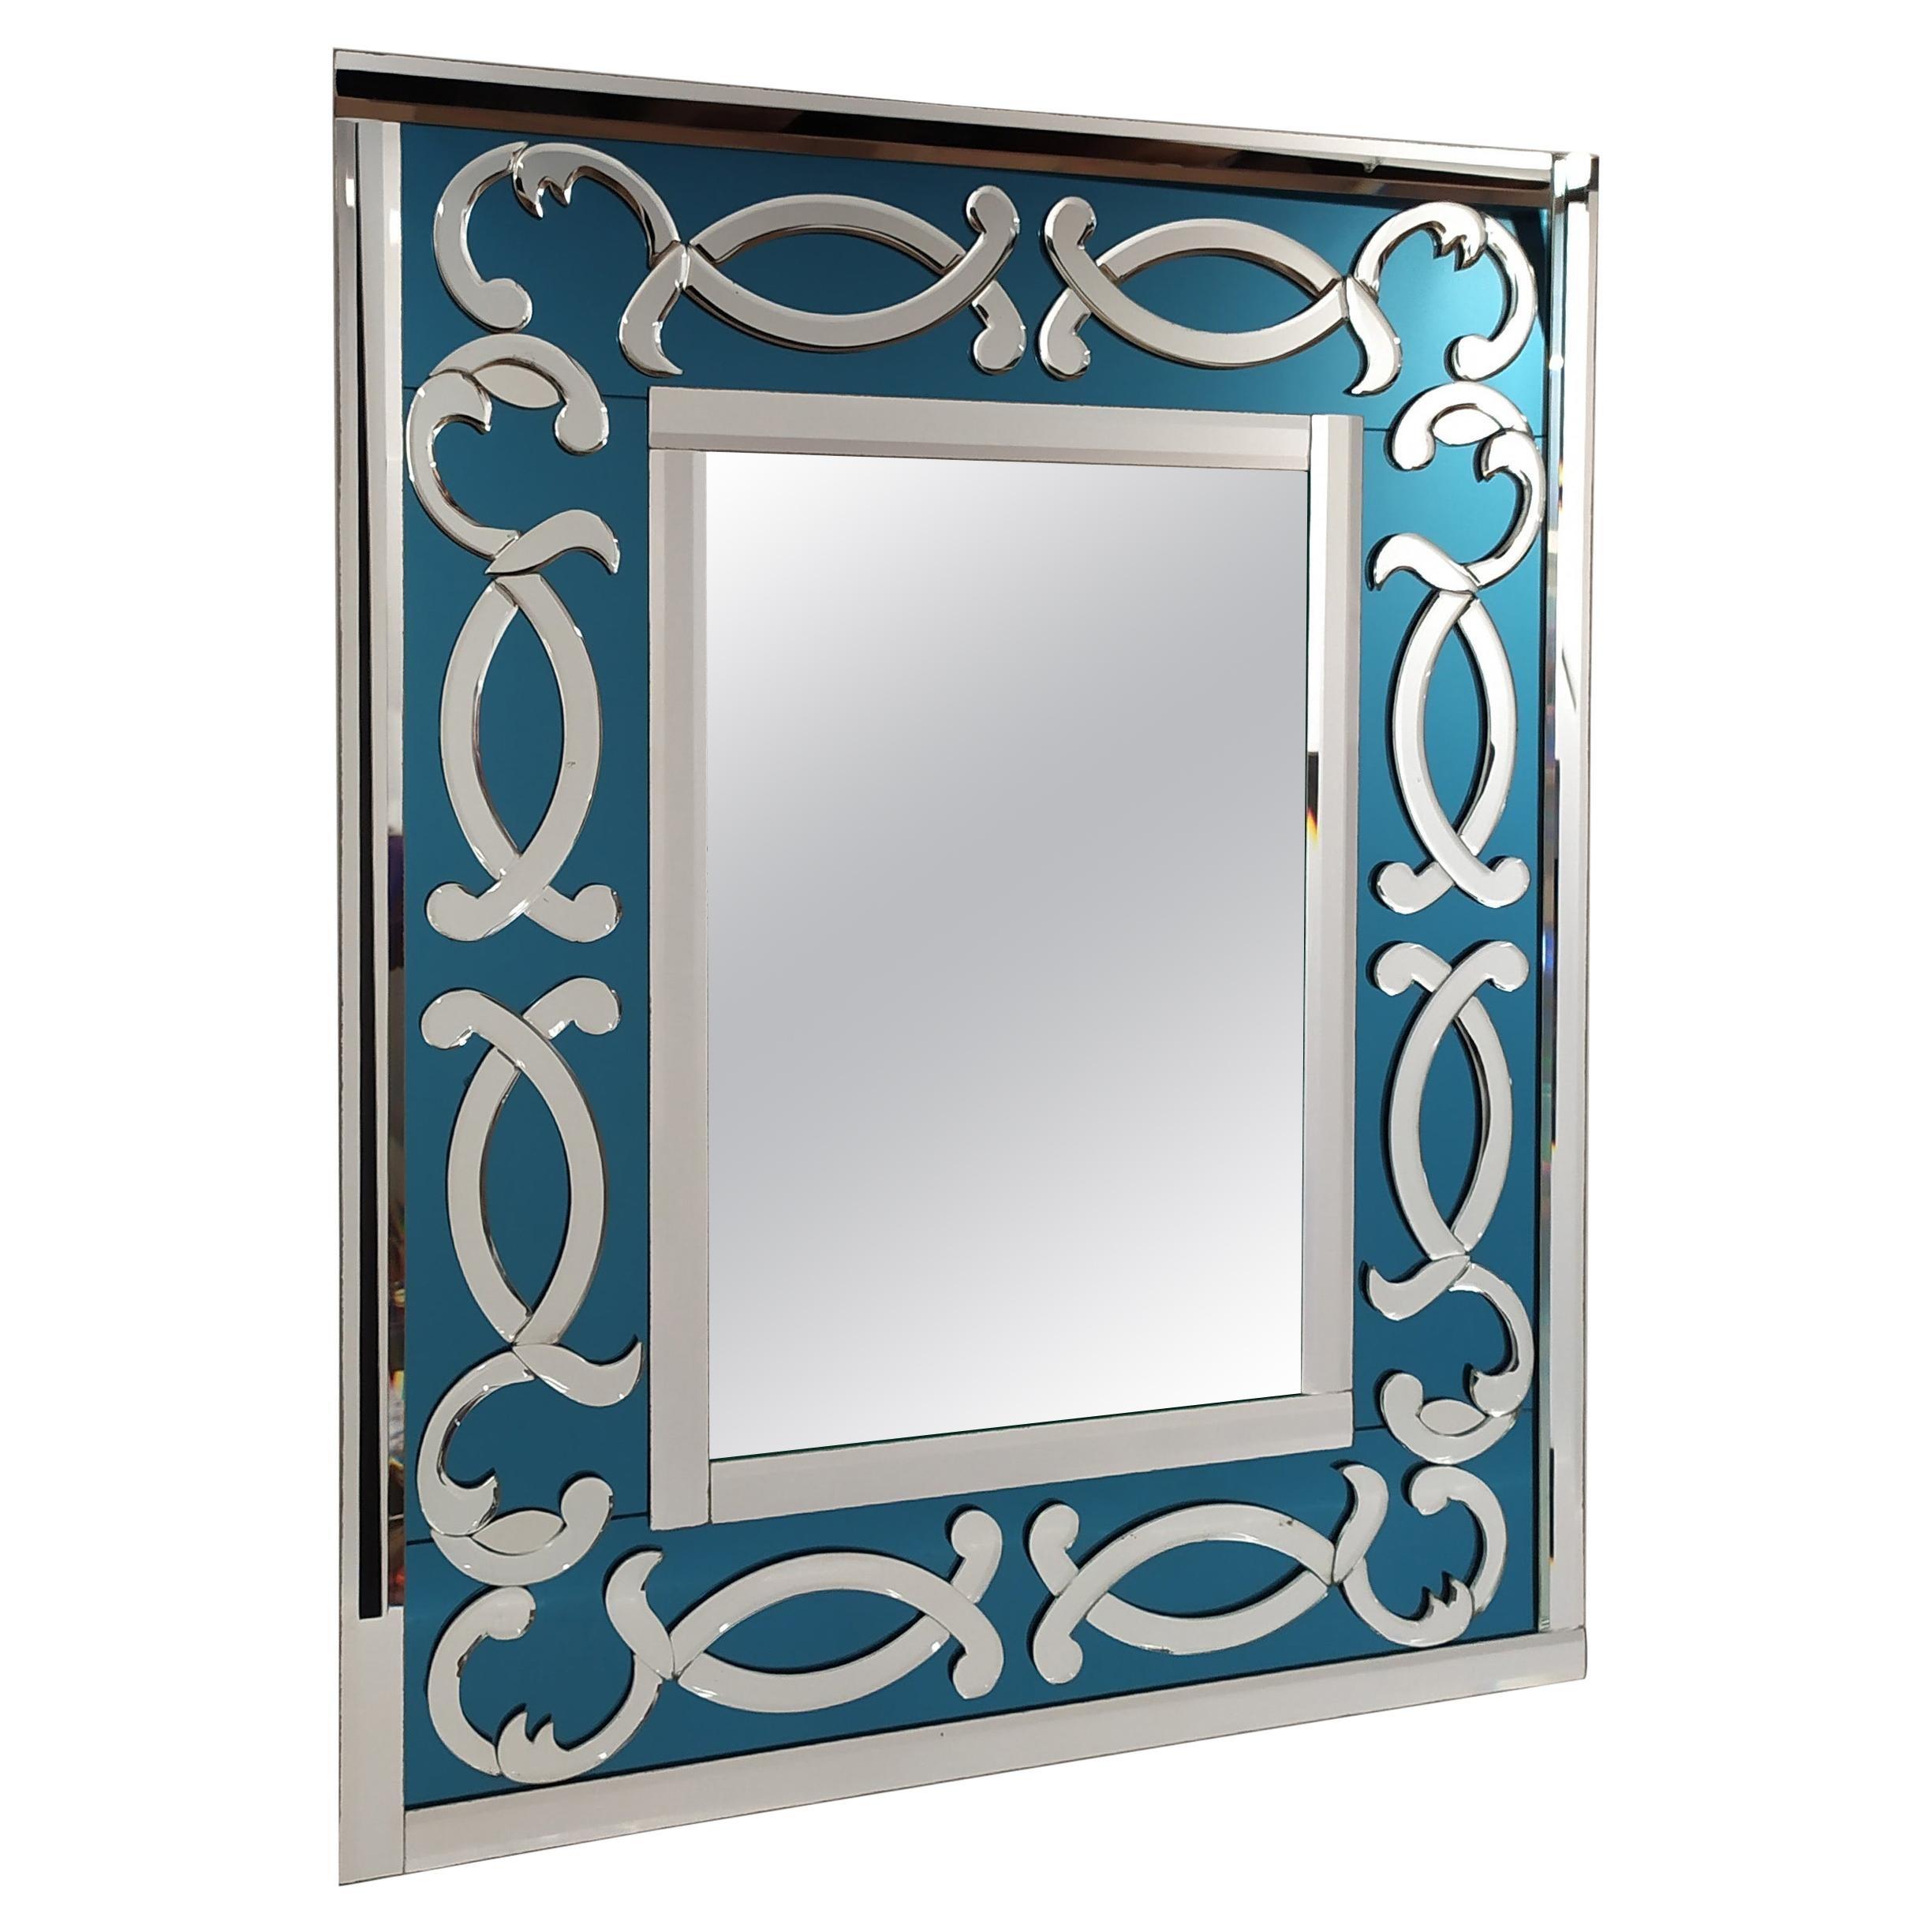 Blue Sea, Contemporay Murano Glass Mirror Bevelled, by Fratelli Tosi